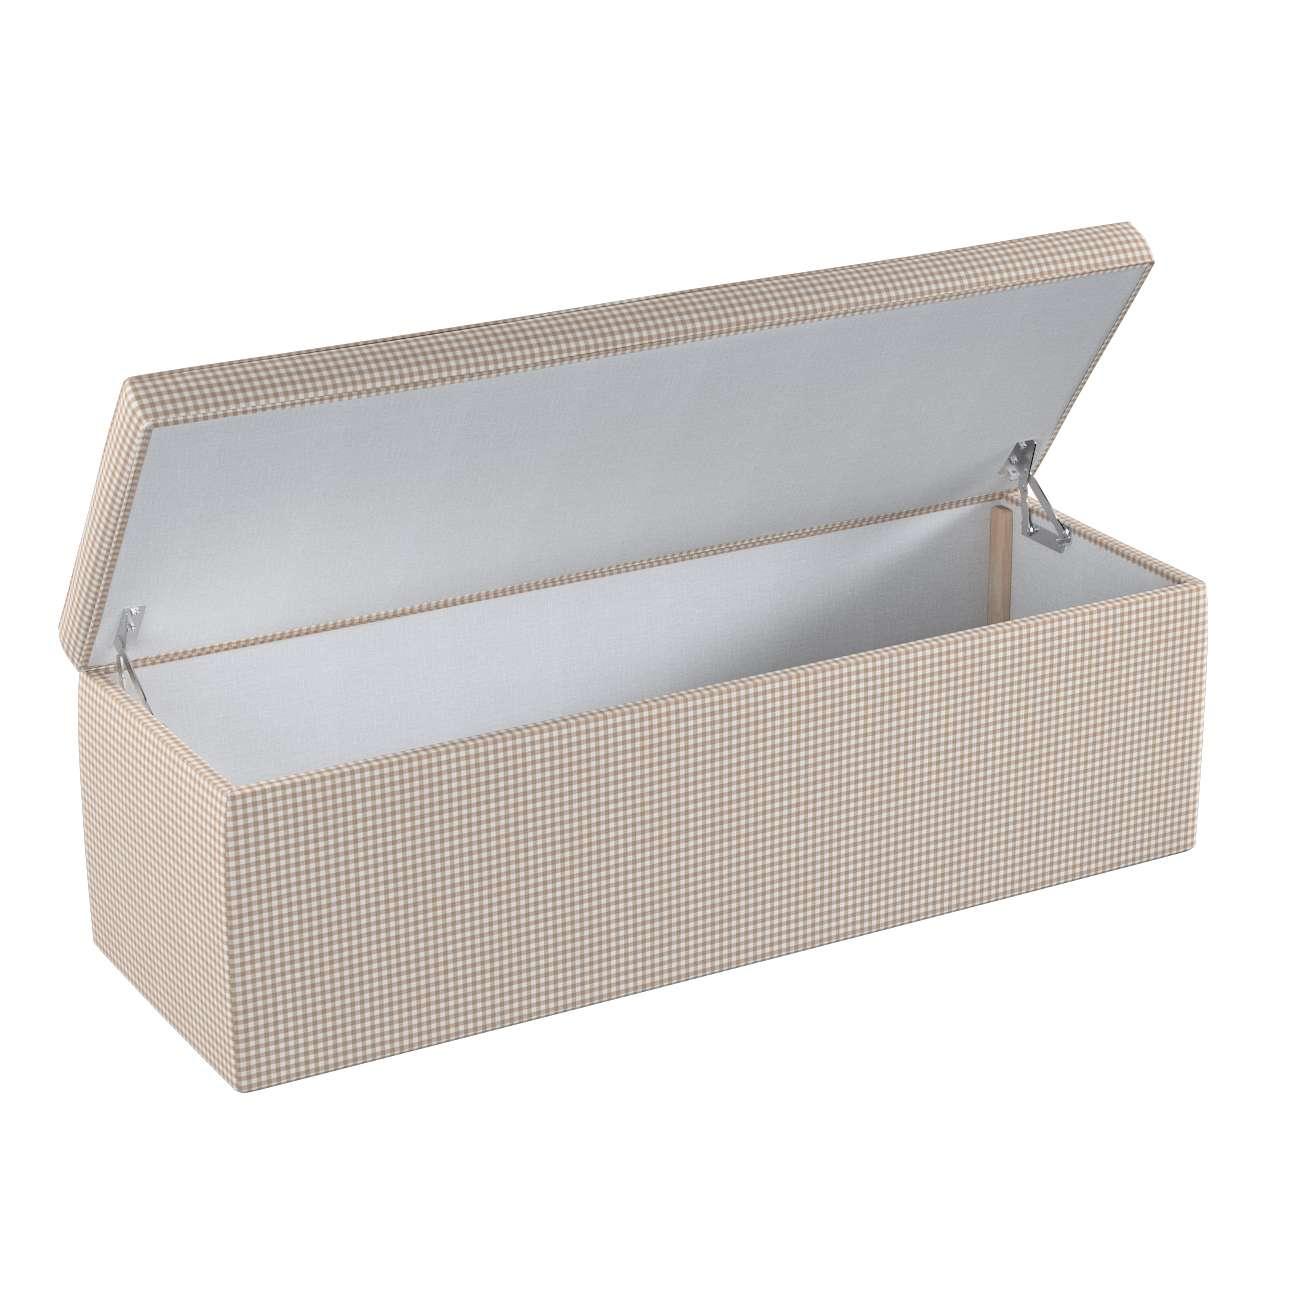 Dežė/skrynia/daiktadėžė 90 x 40 x 40 cm kolekcijoje Quadro, audinys: 136-05